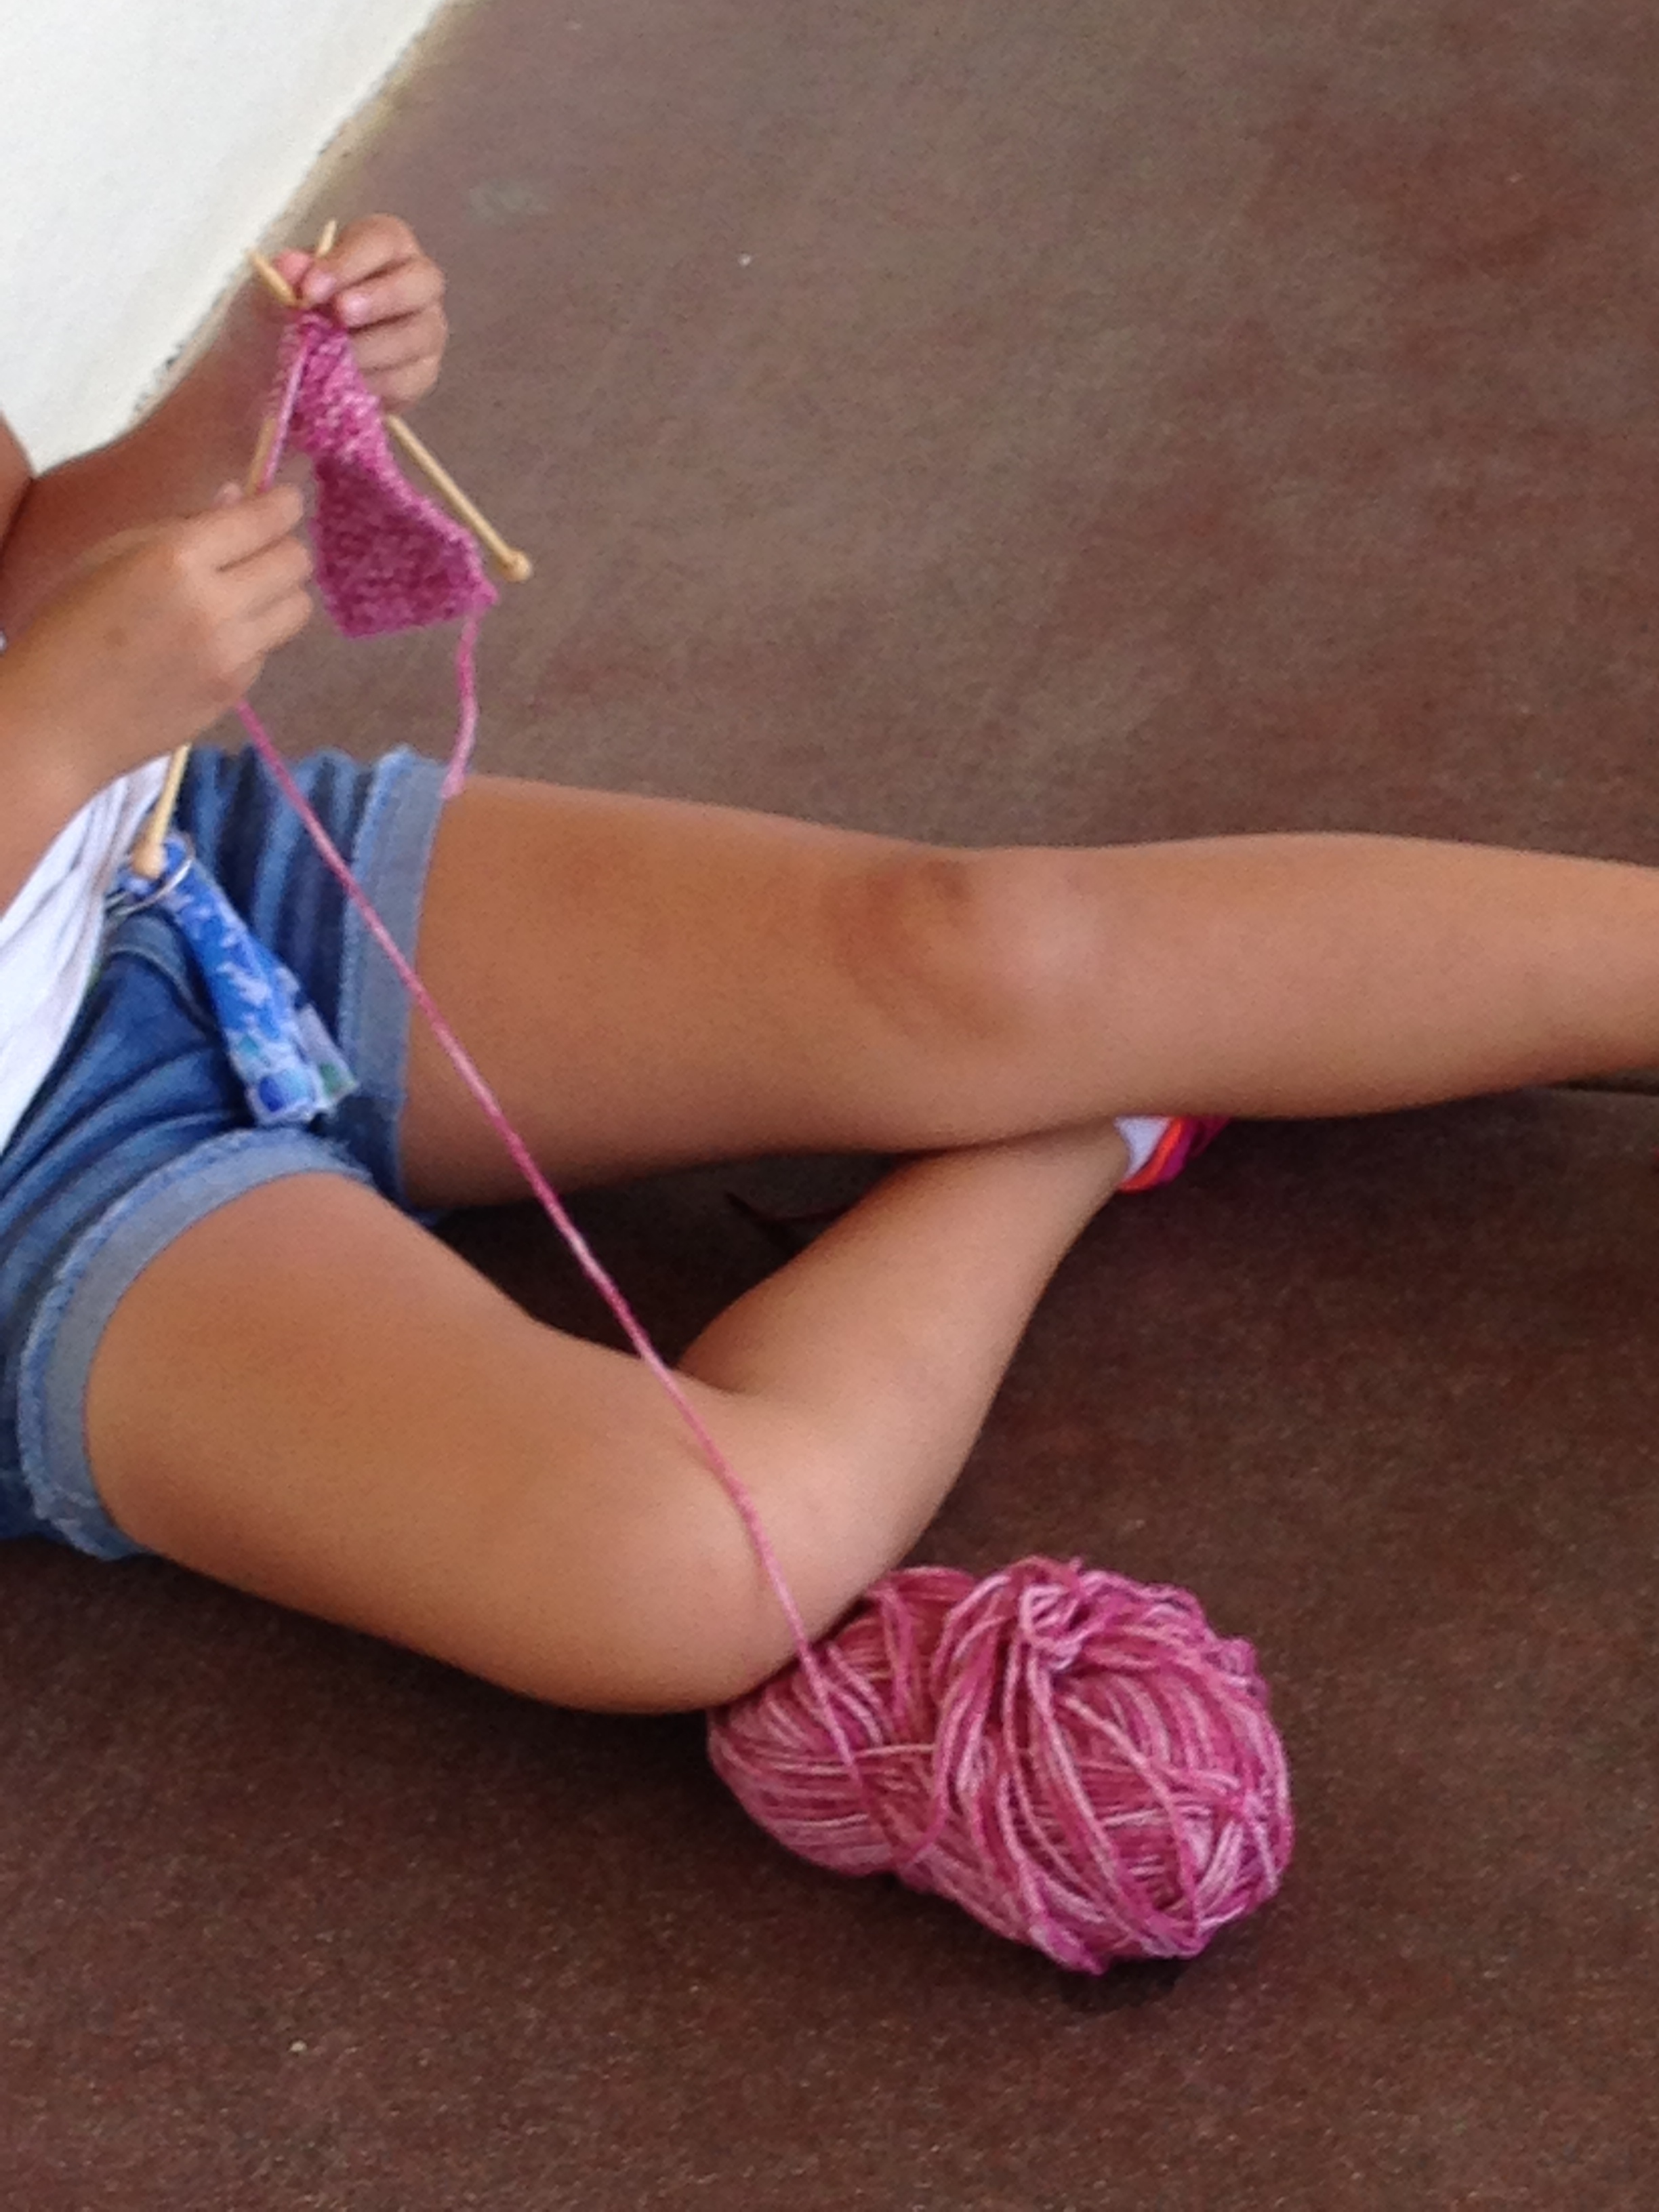 More knitting.